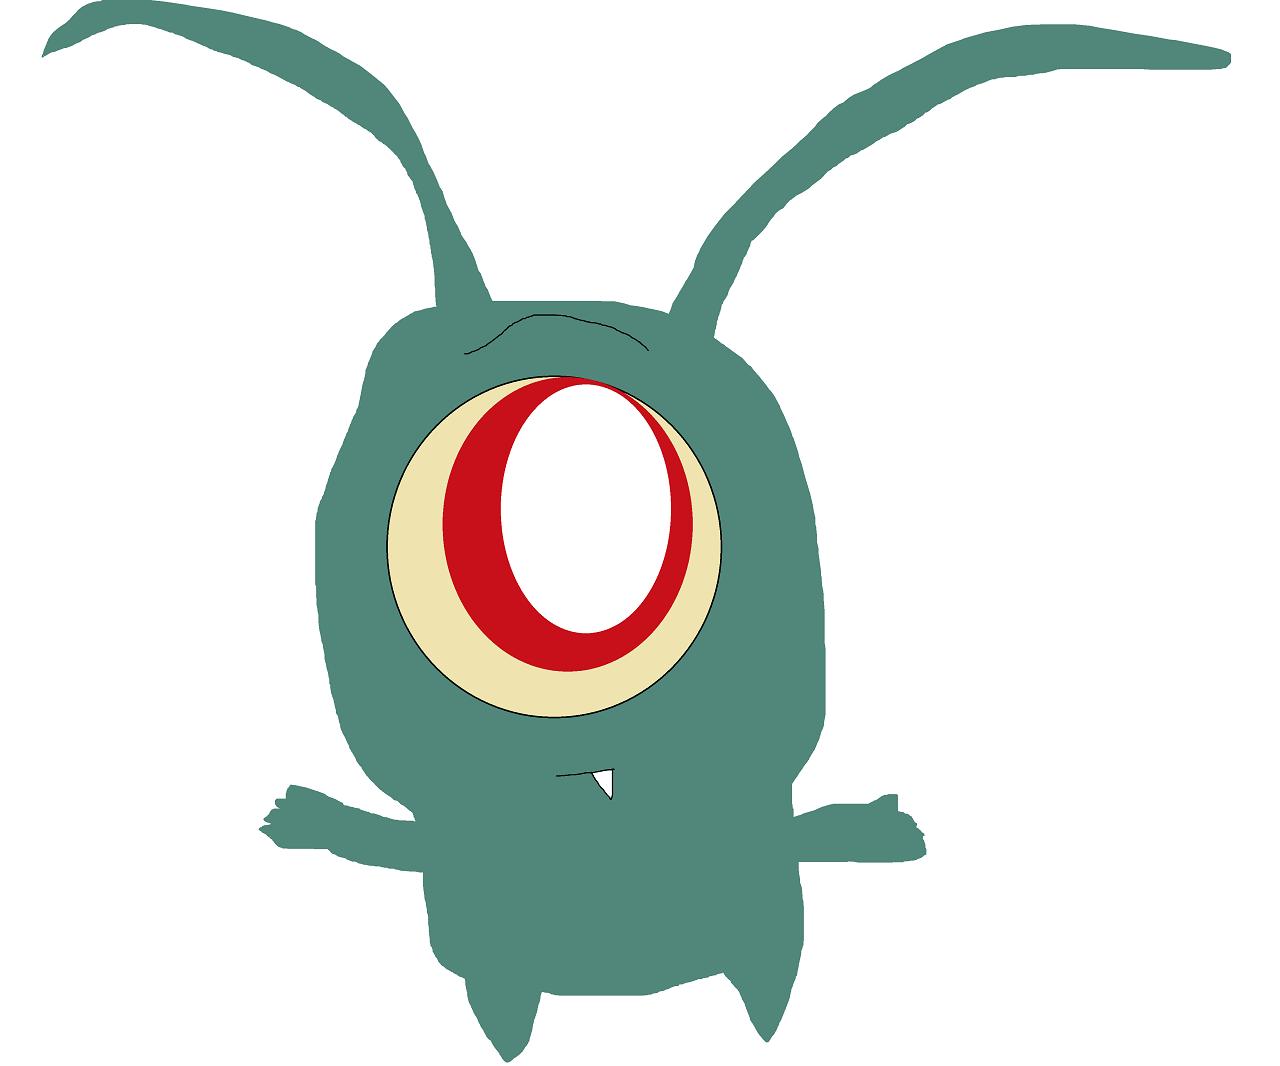 Random Plankton Cheeb by Falconlobo